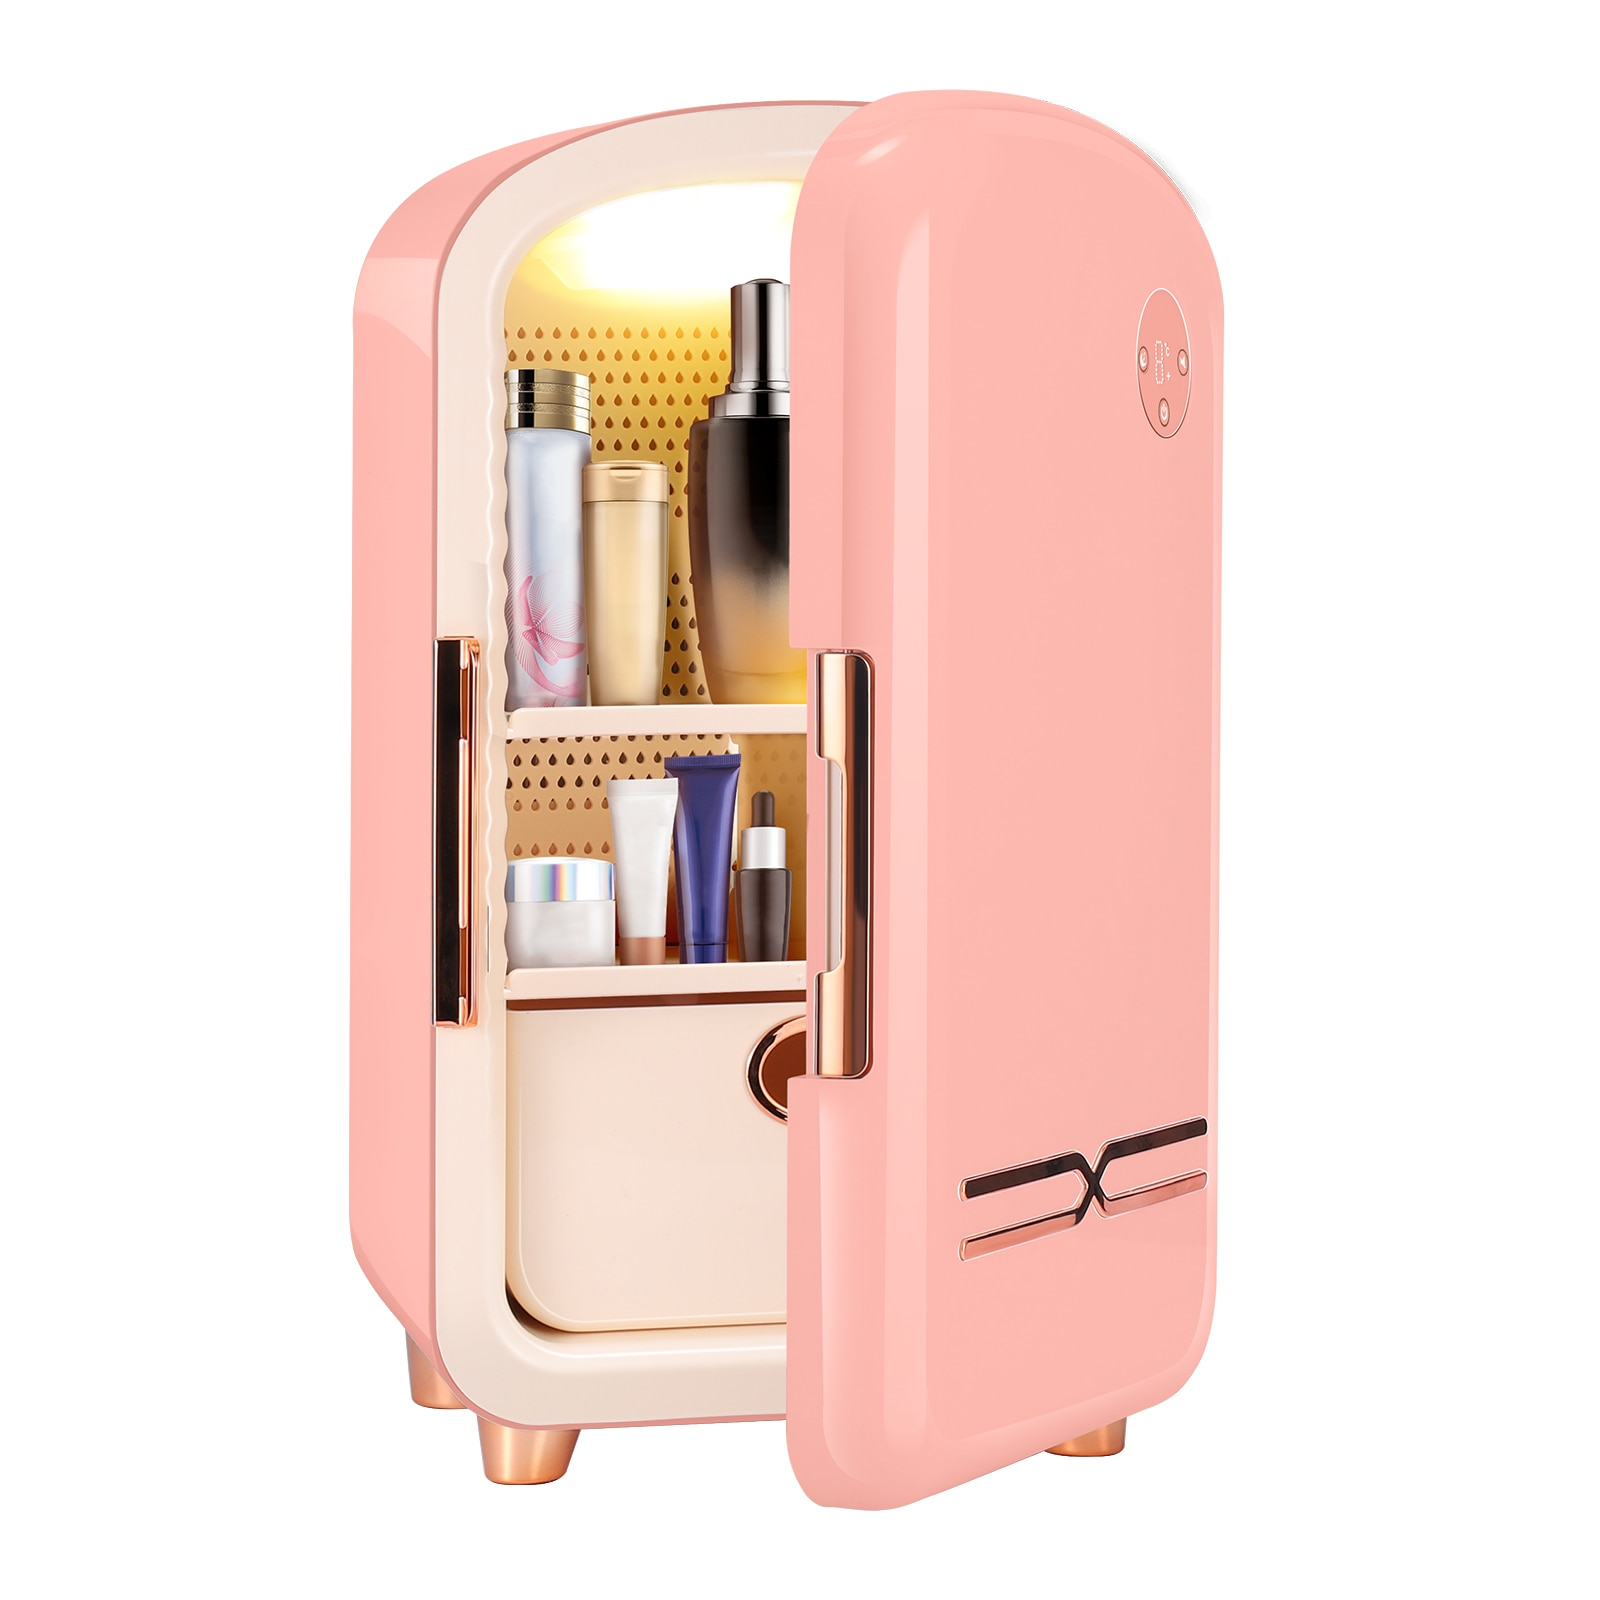 12L Kawaii Mini Makeup Fridge Portable Cosmetic Refrigerator Compact Glass Panel Led Light Cooler Warmer Freezer Home Car Use